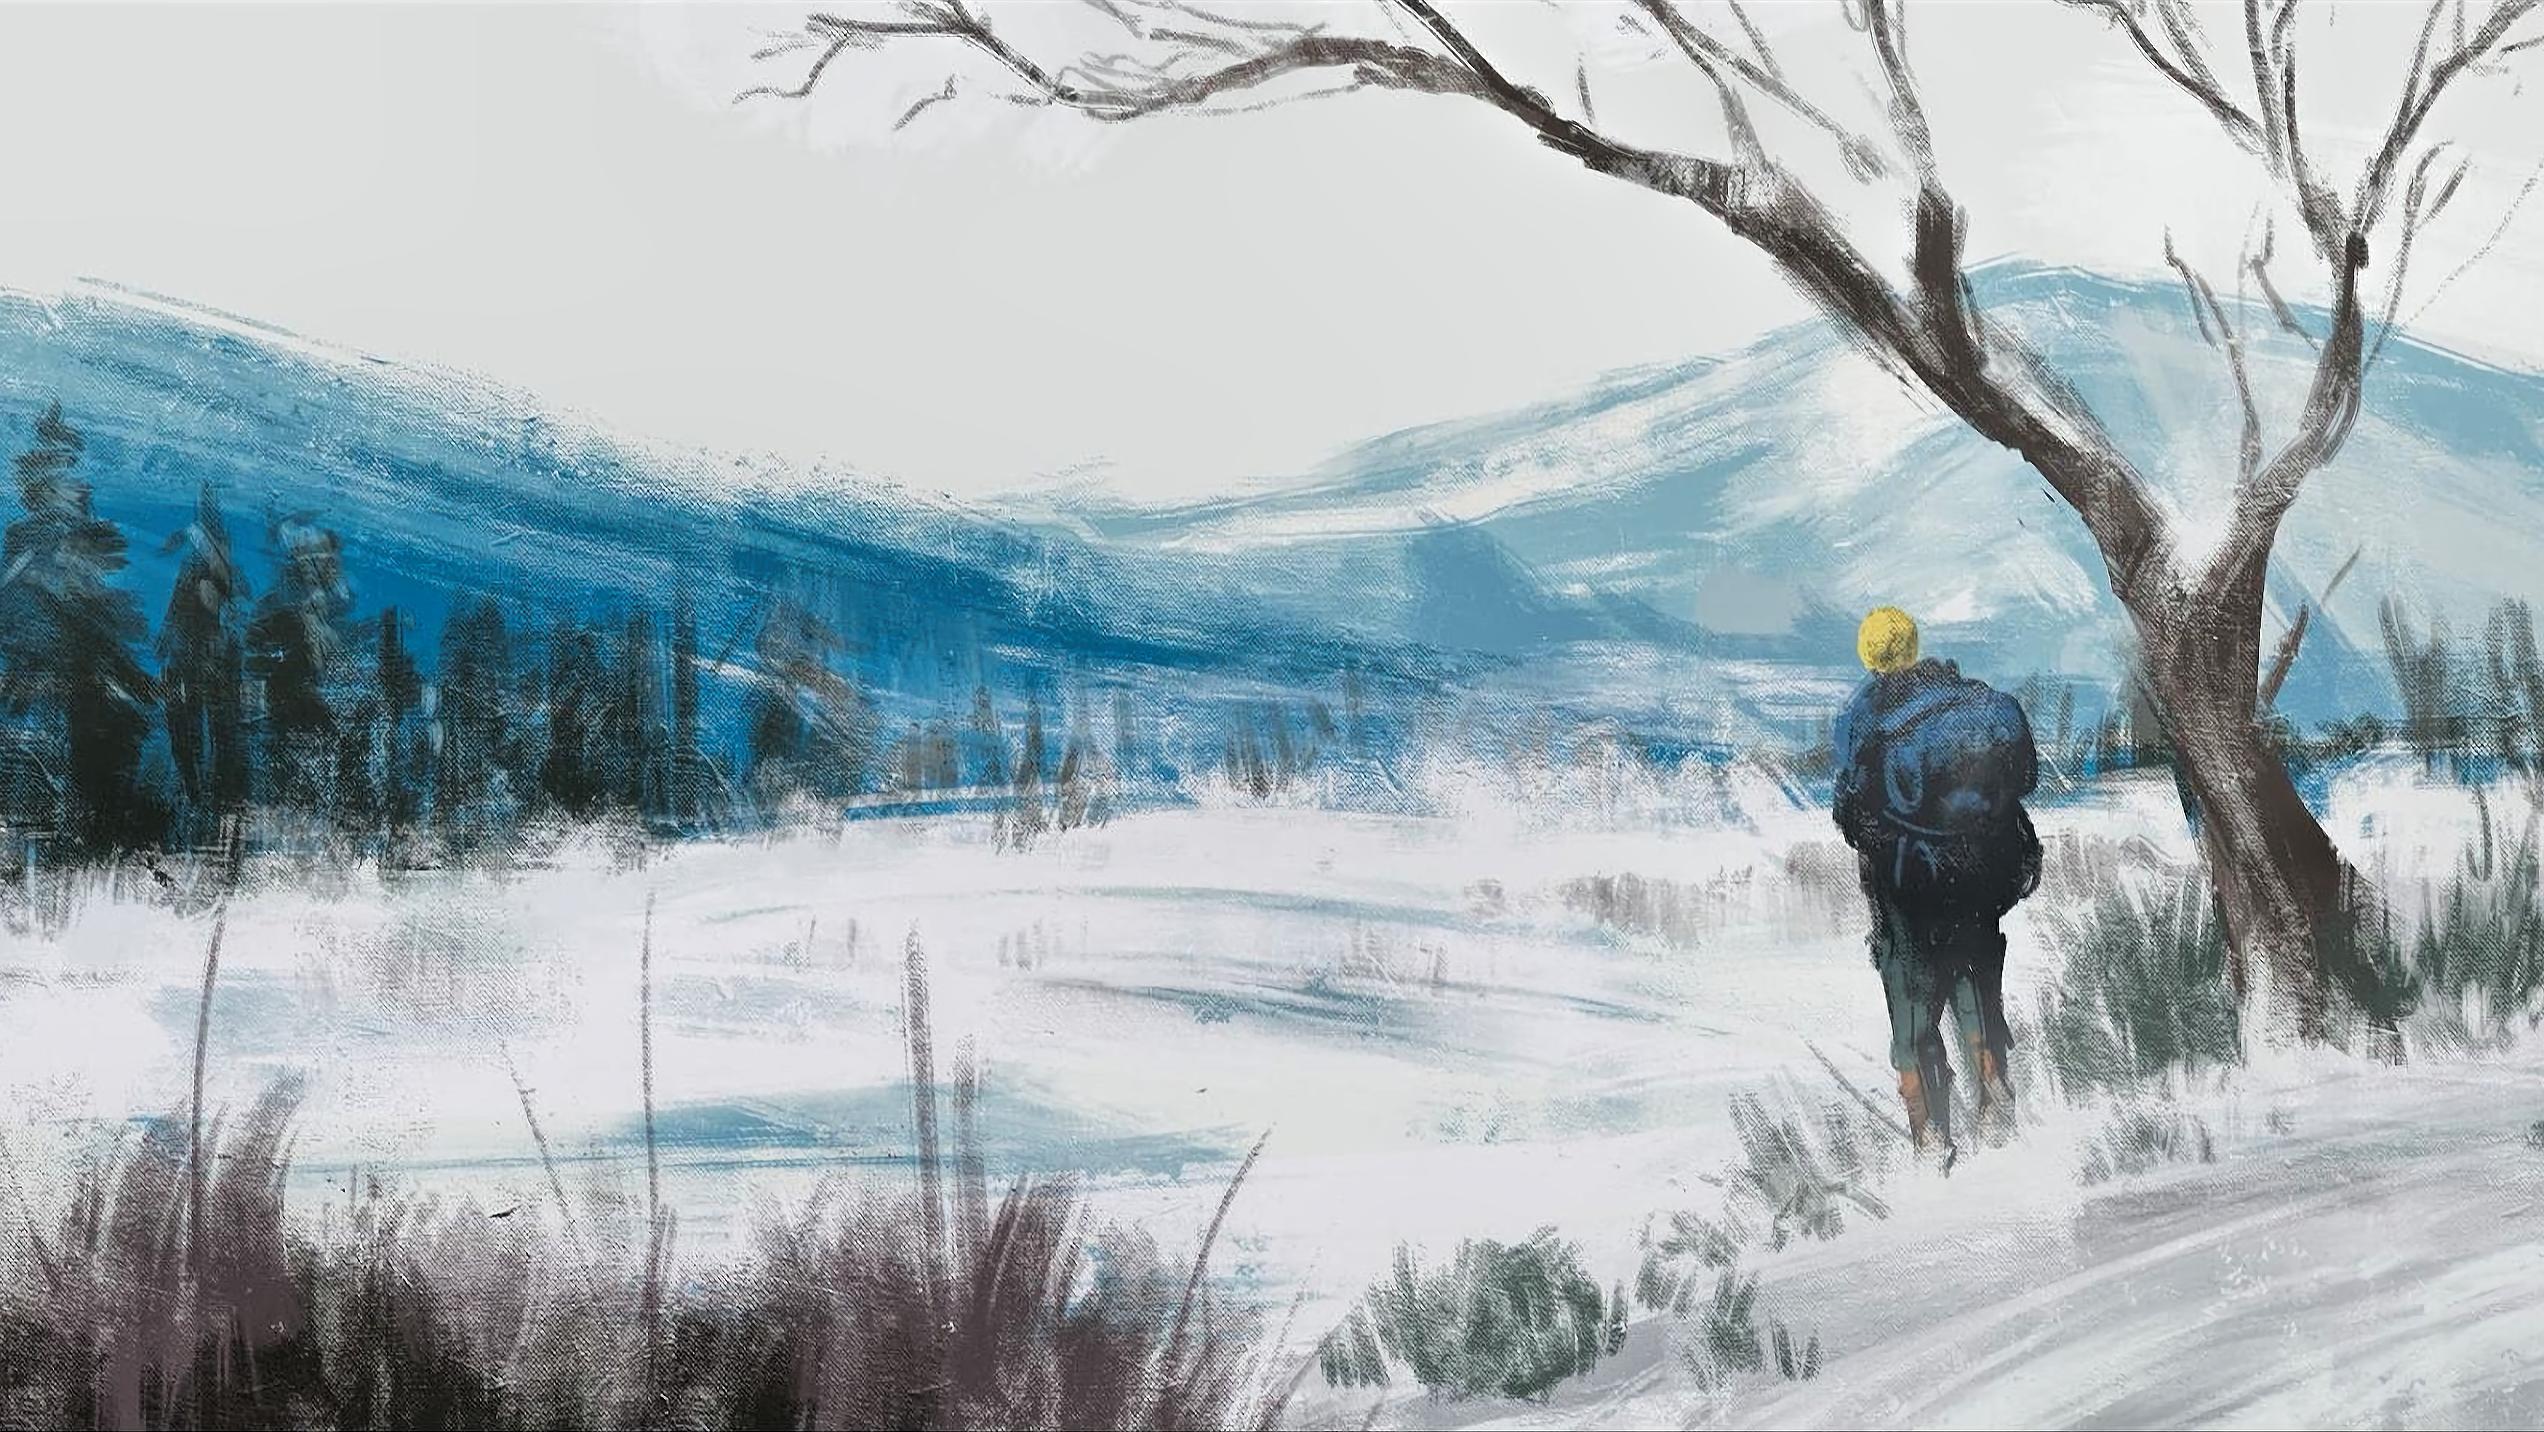 Wallpaper Forest Landscape Winter Imad Awan Artwork